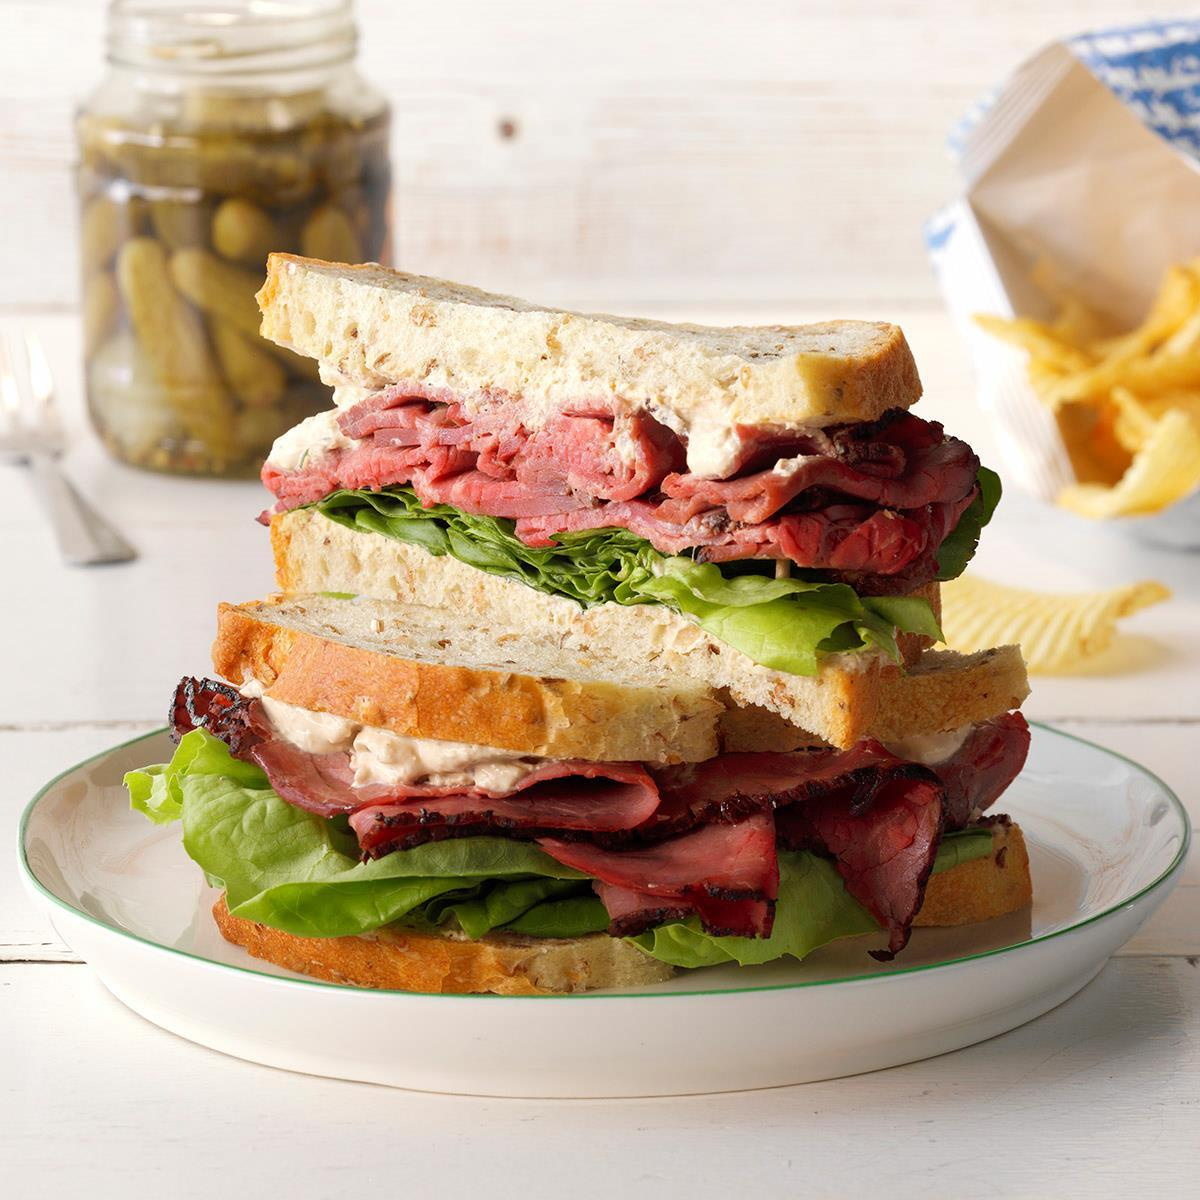 Lunch, Choice C: Roast beef